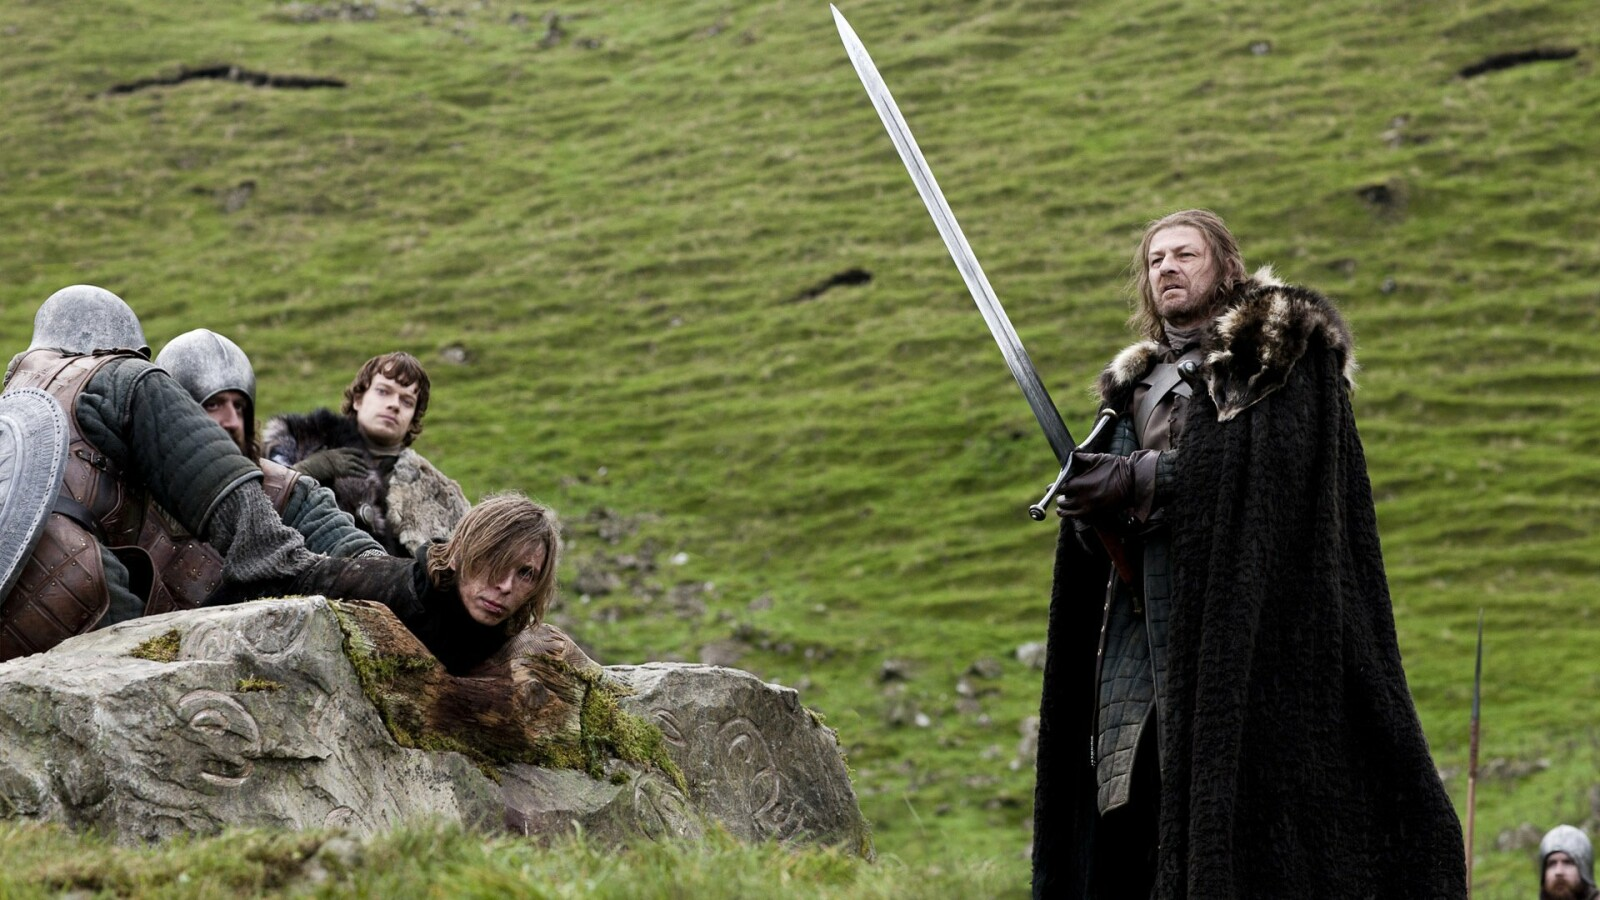 Game Of Thrones Staffel 1 Folge 1 Kostenlos